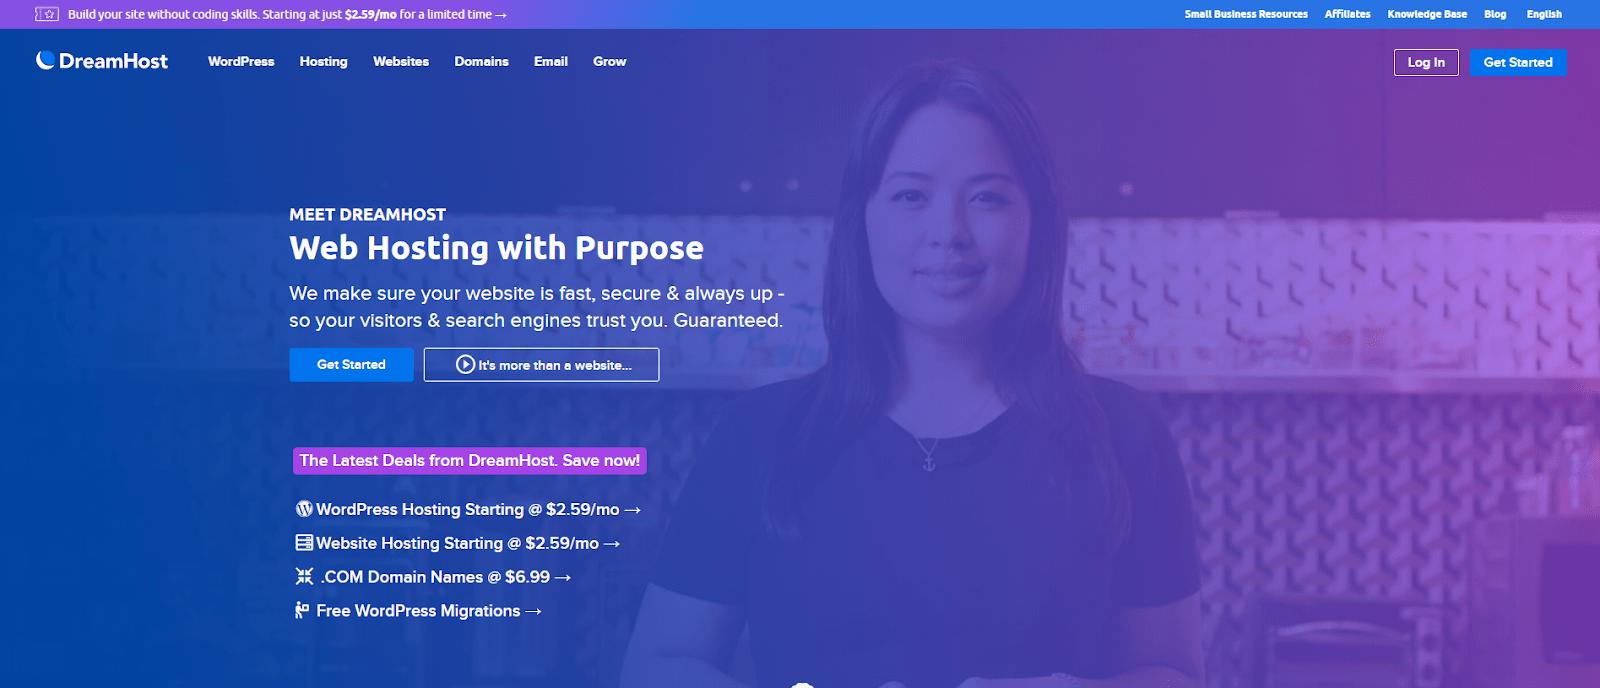 DreamHost Web Host Nonprofits